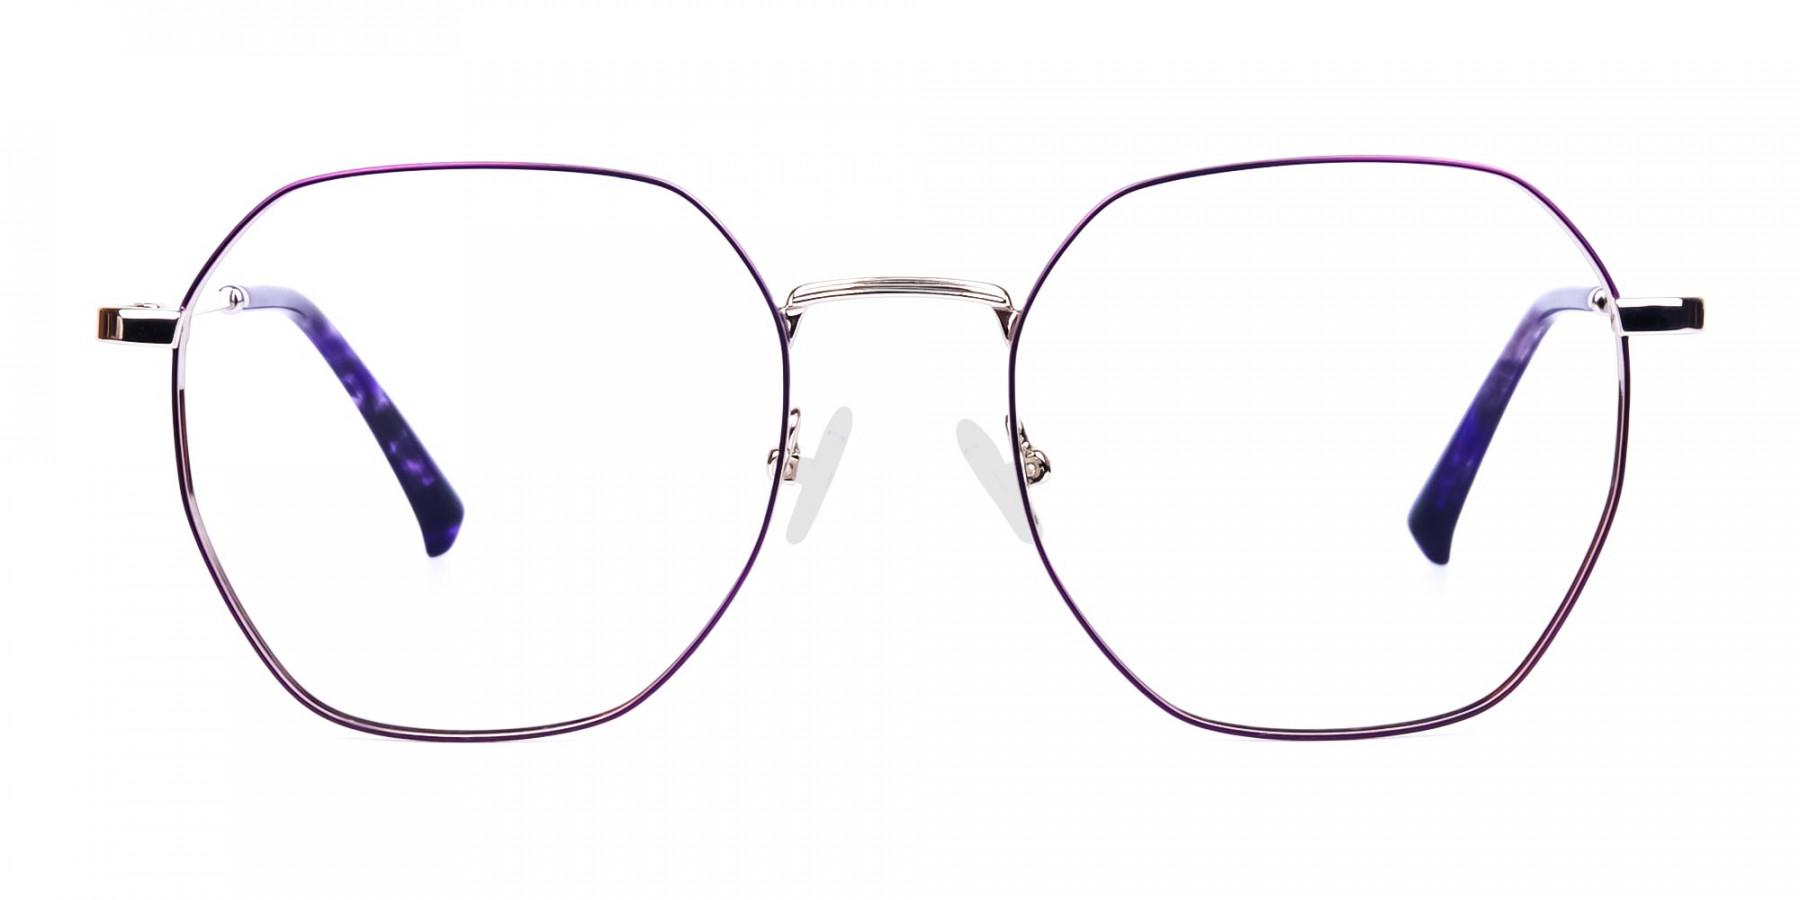 Dark-Violet-and-Silver-Geometric-Glasses-1